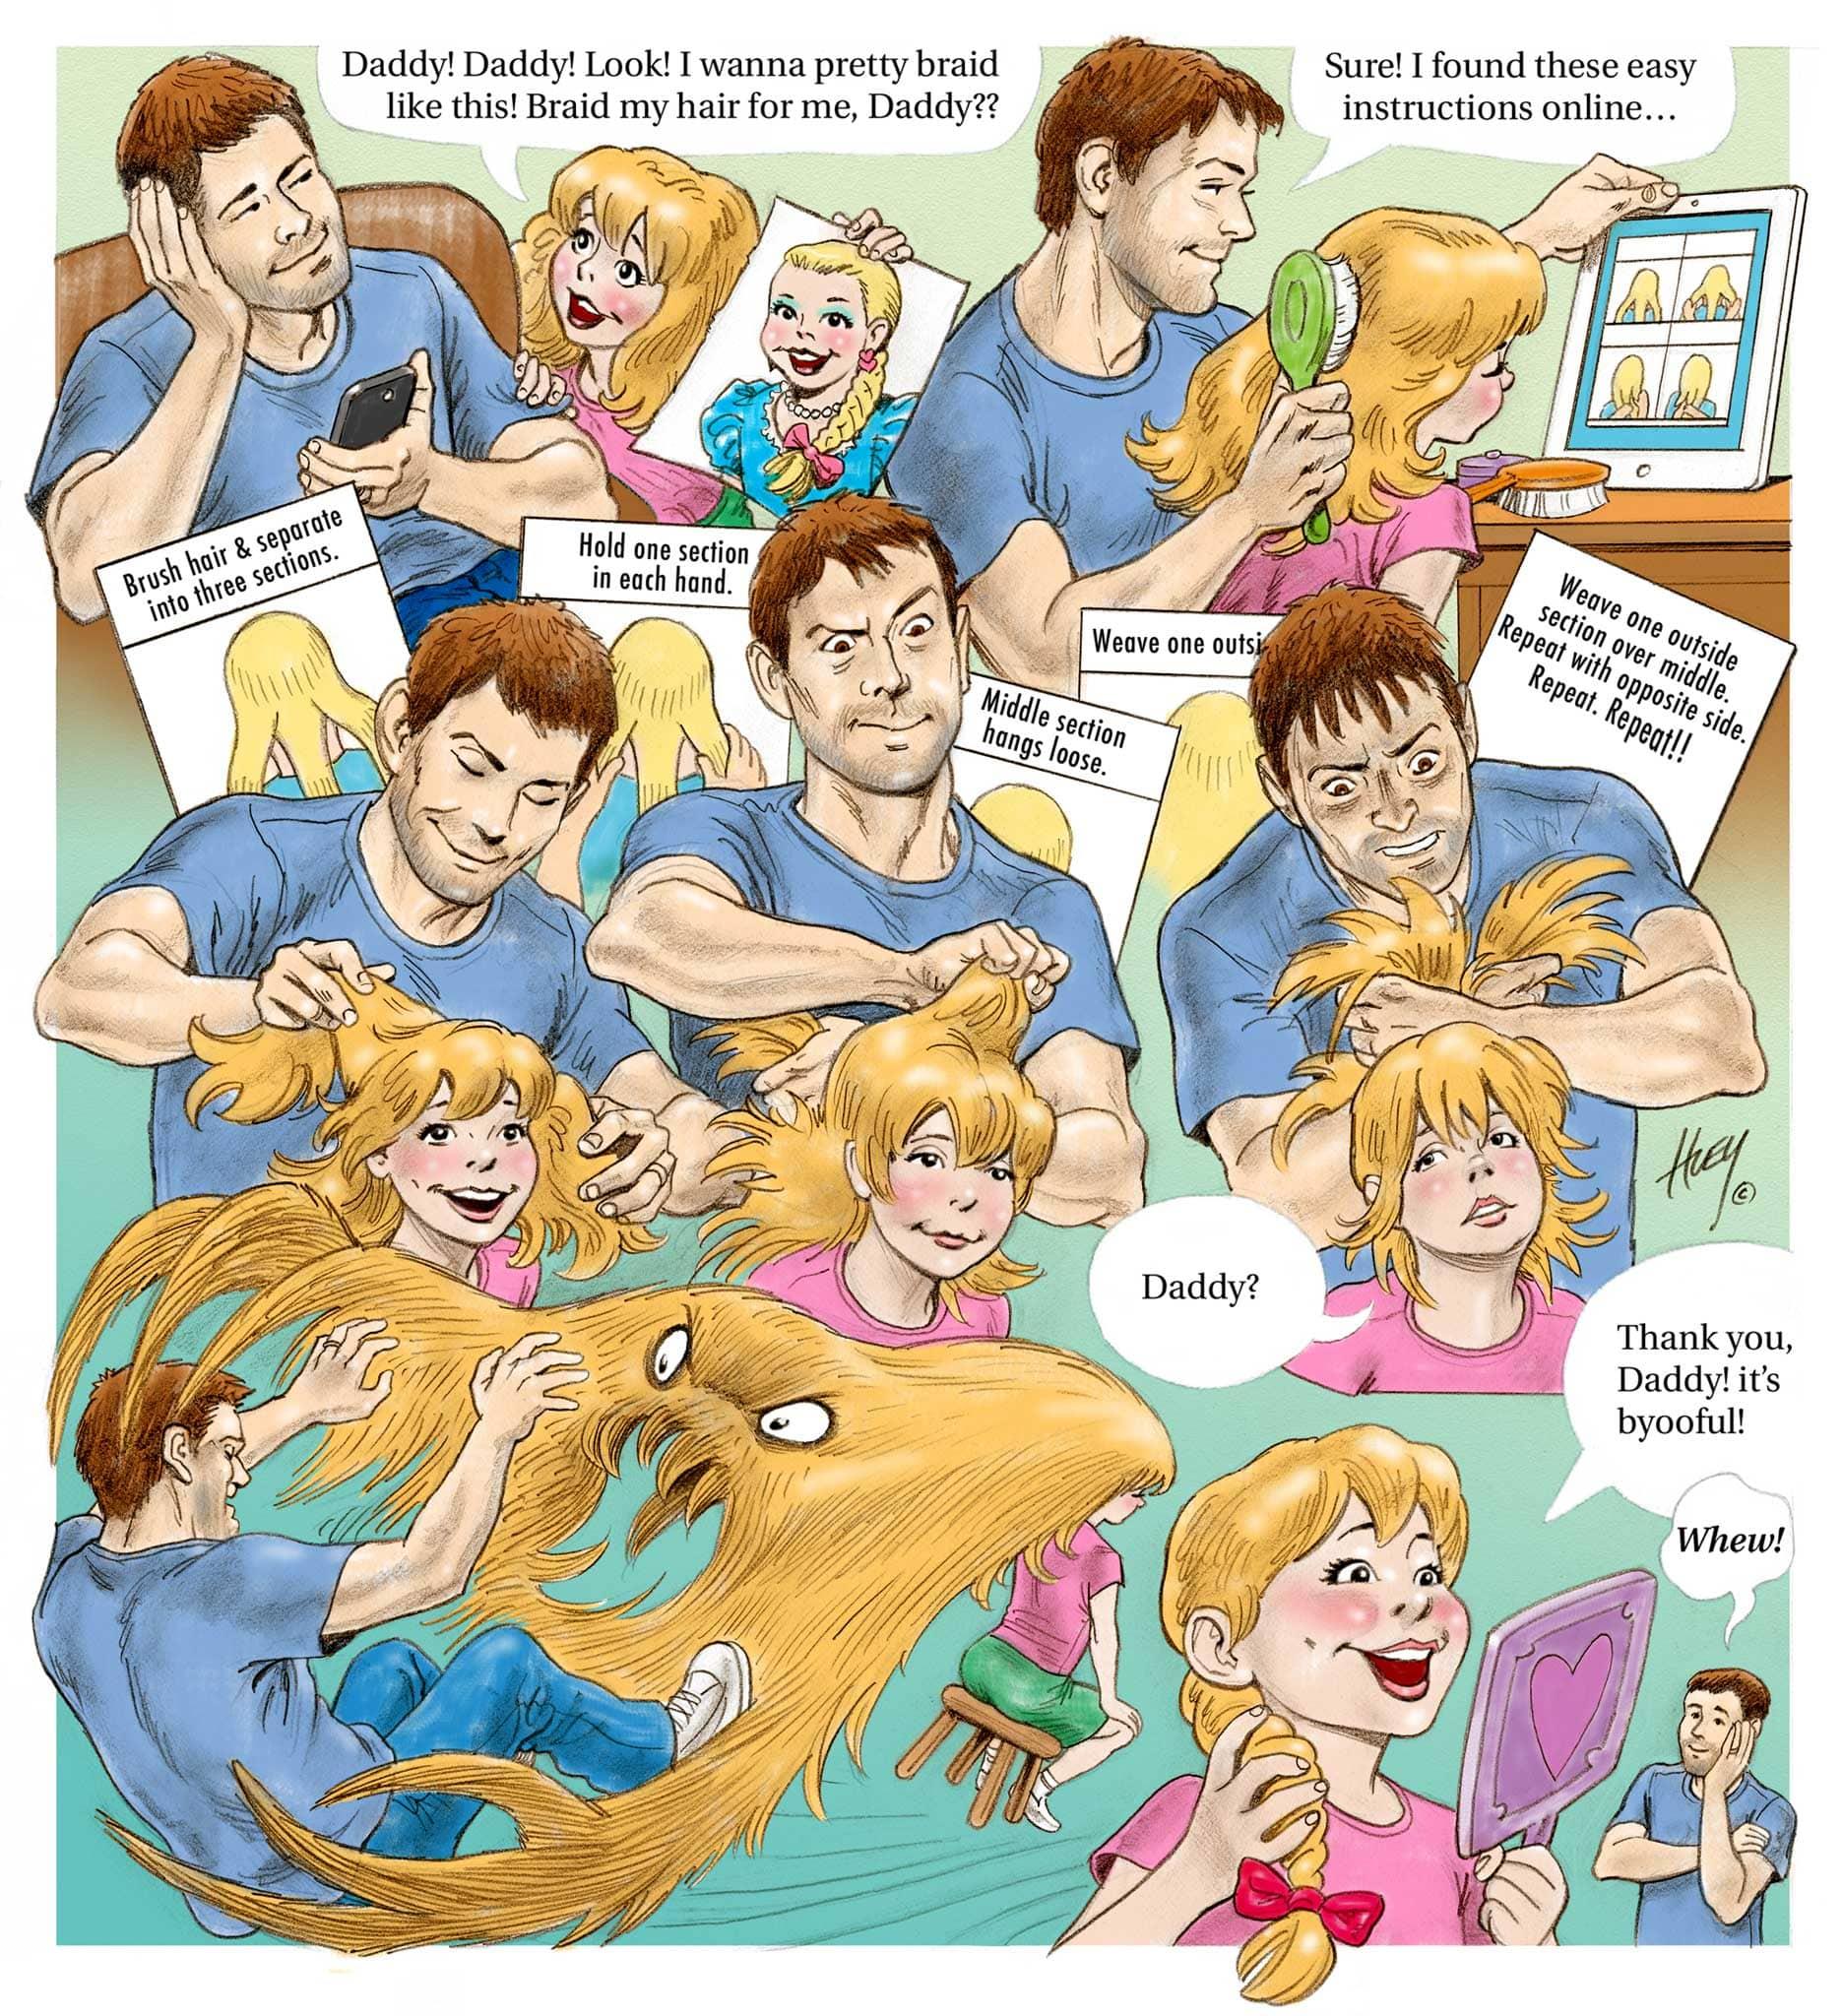 KH3510-dad-braiding-daughters-hair